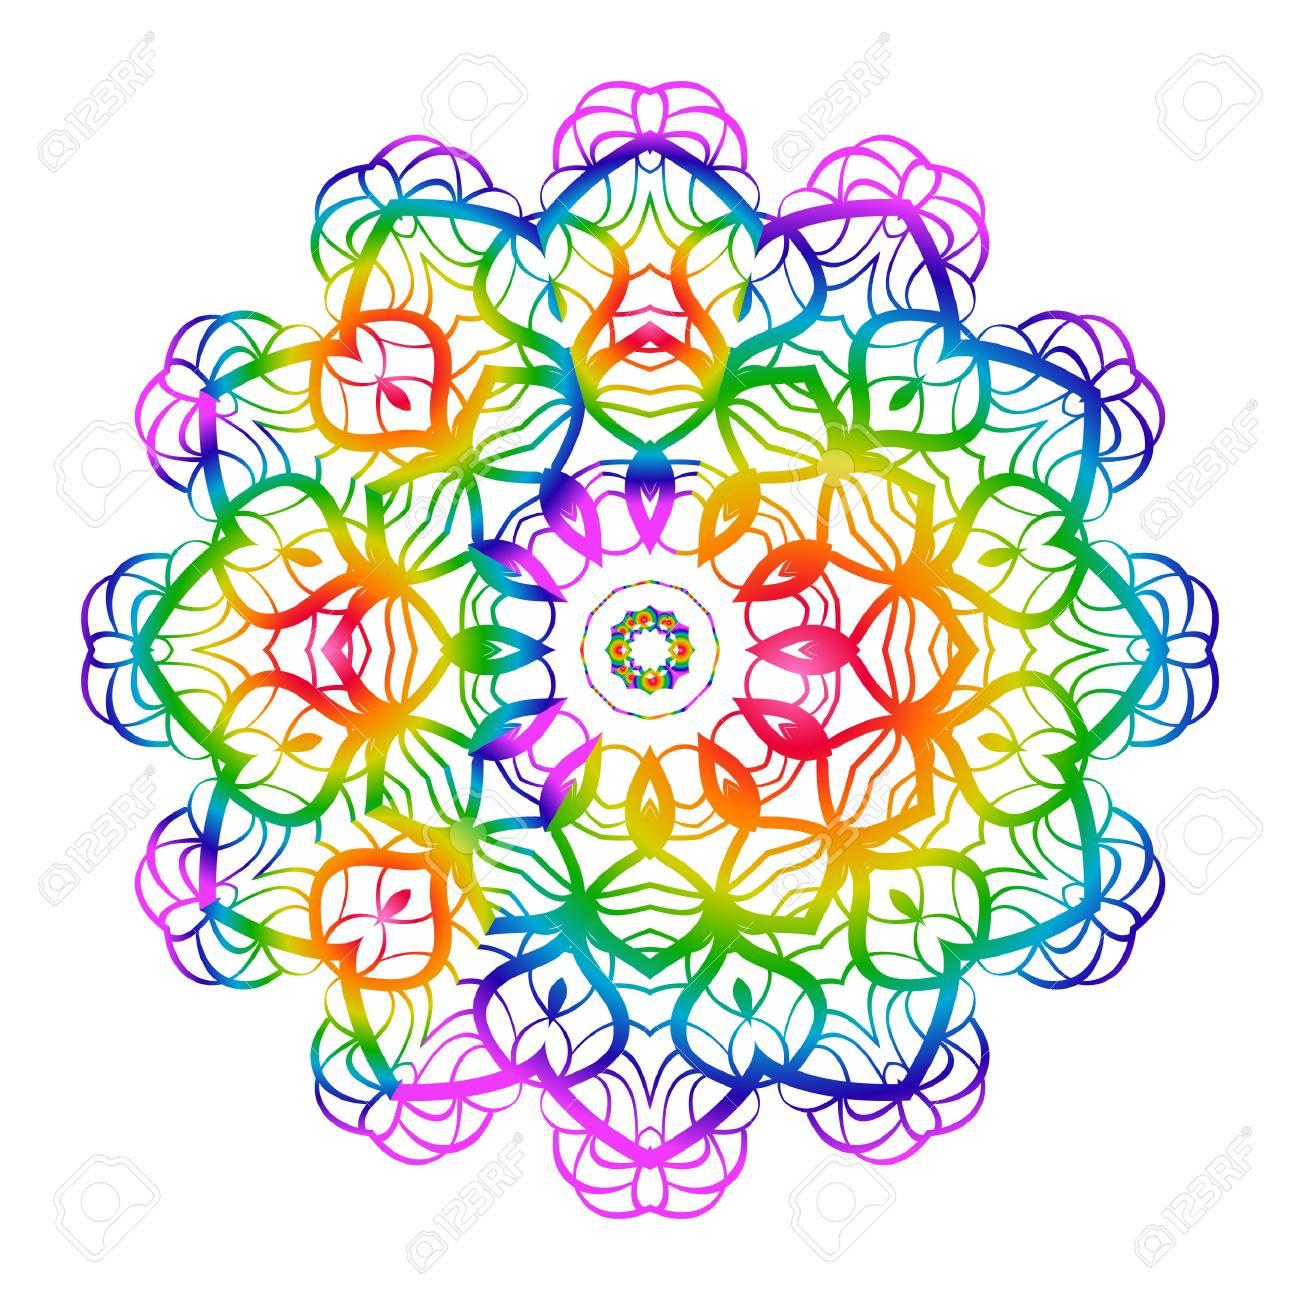 37b75efec1e5b Rainbow color Hand-Drawn Henna Ethnic Mandala. Circle lace ornament. Vector  illustration.